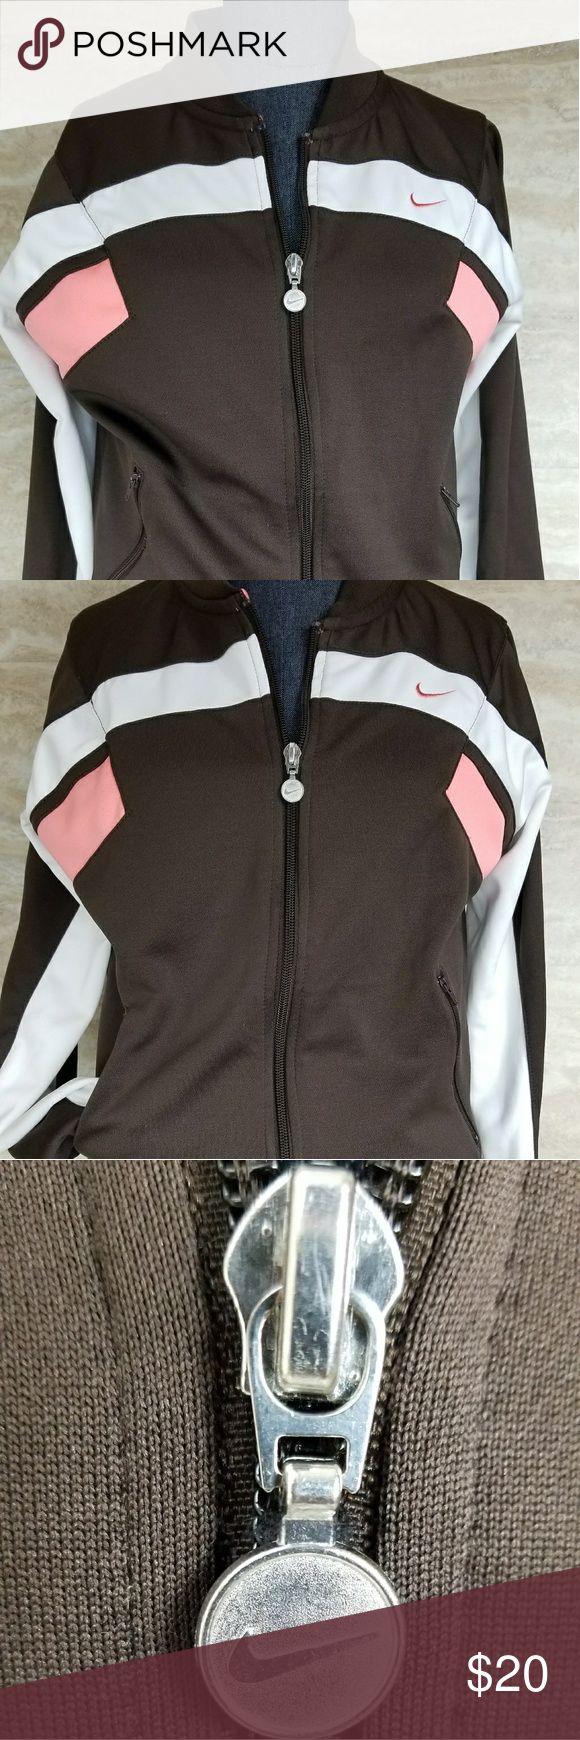 Womens Nike Zip up jacket Nike Zip up jacket. Great condition. Retro look Nike Jackets & Coats